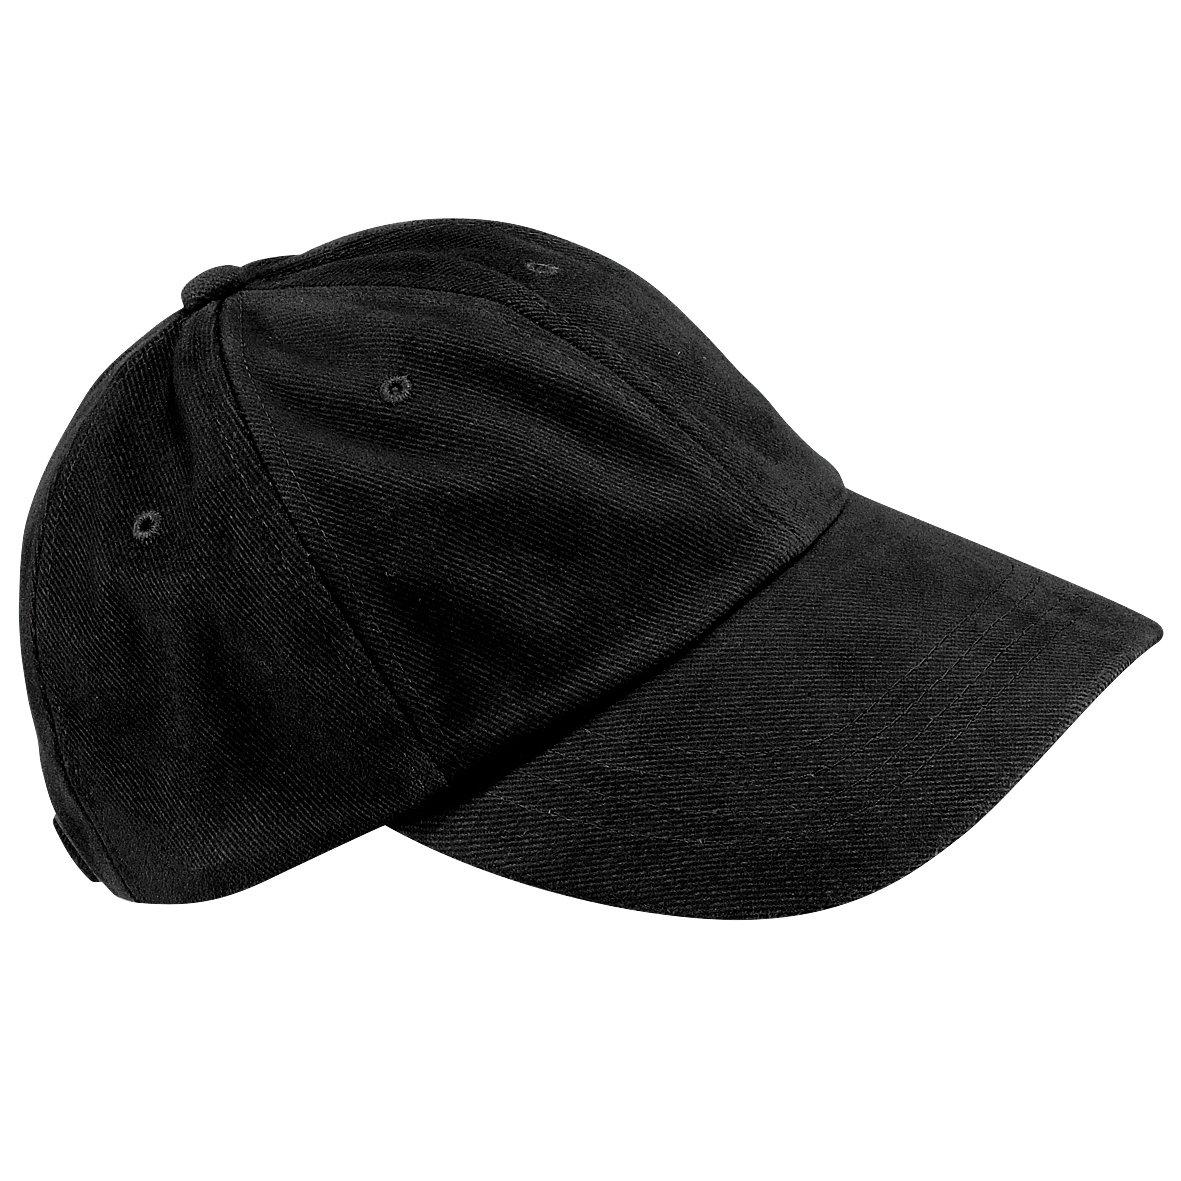 Low profile heavy brushed cotton cap COLOUR Black ONE SIZE